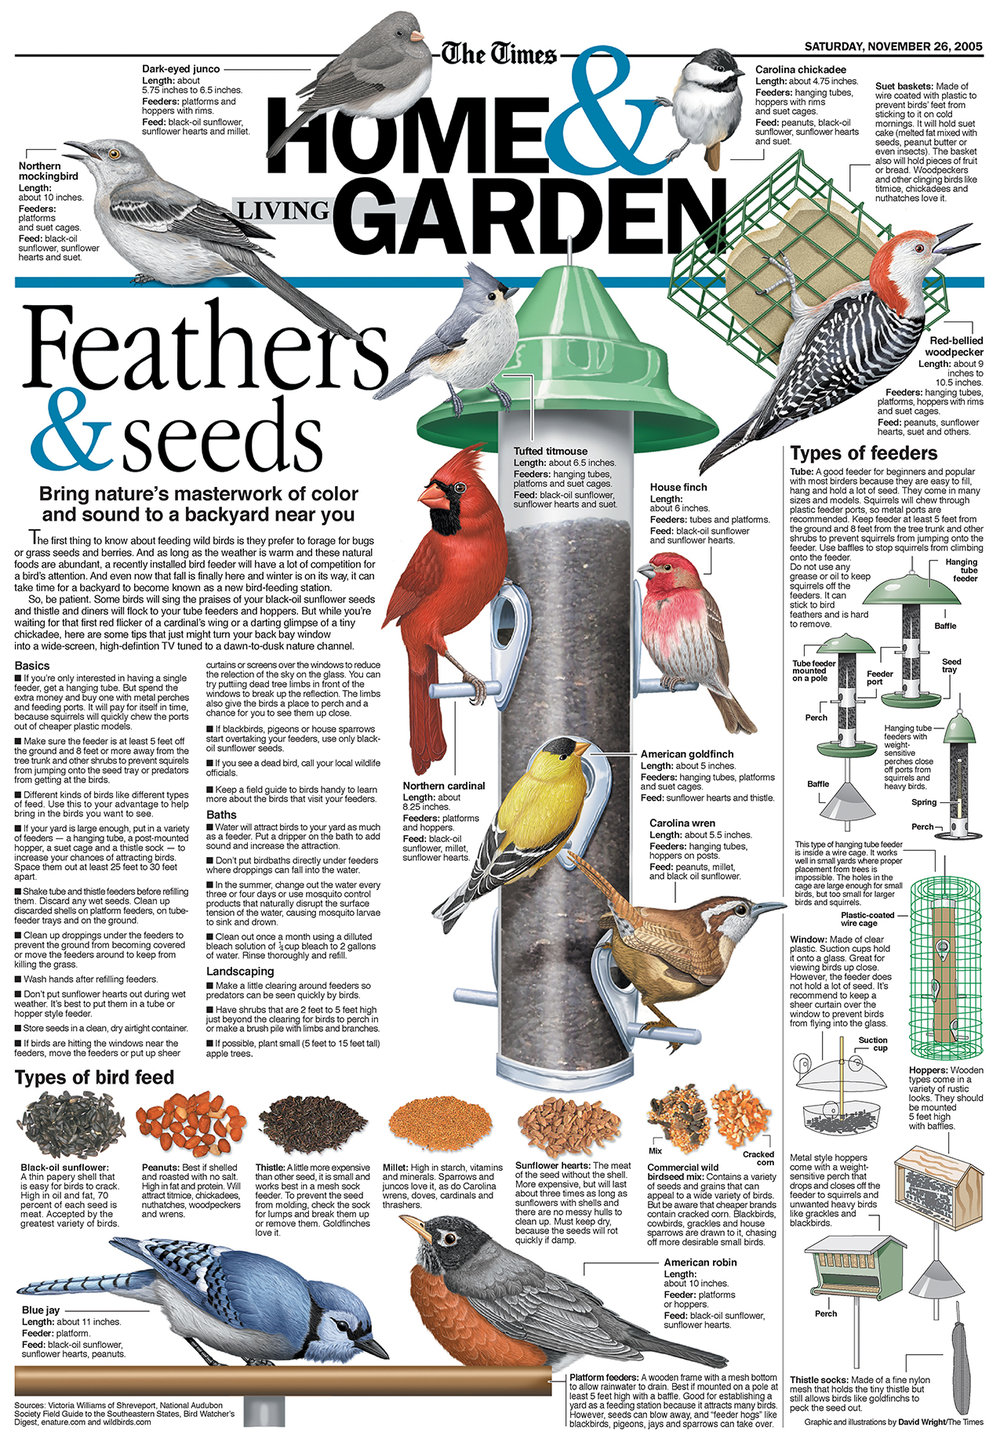 bird feeding graphic SMALL.jpg